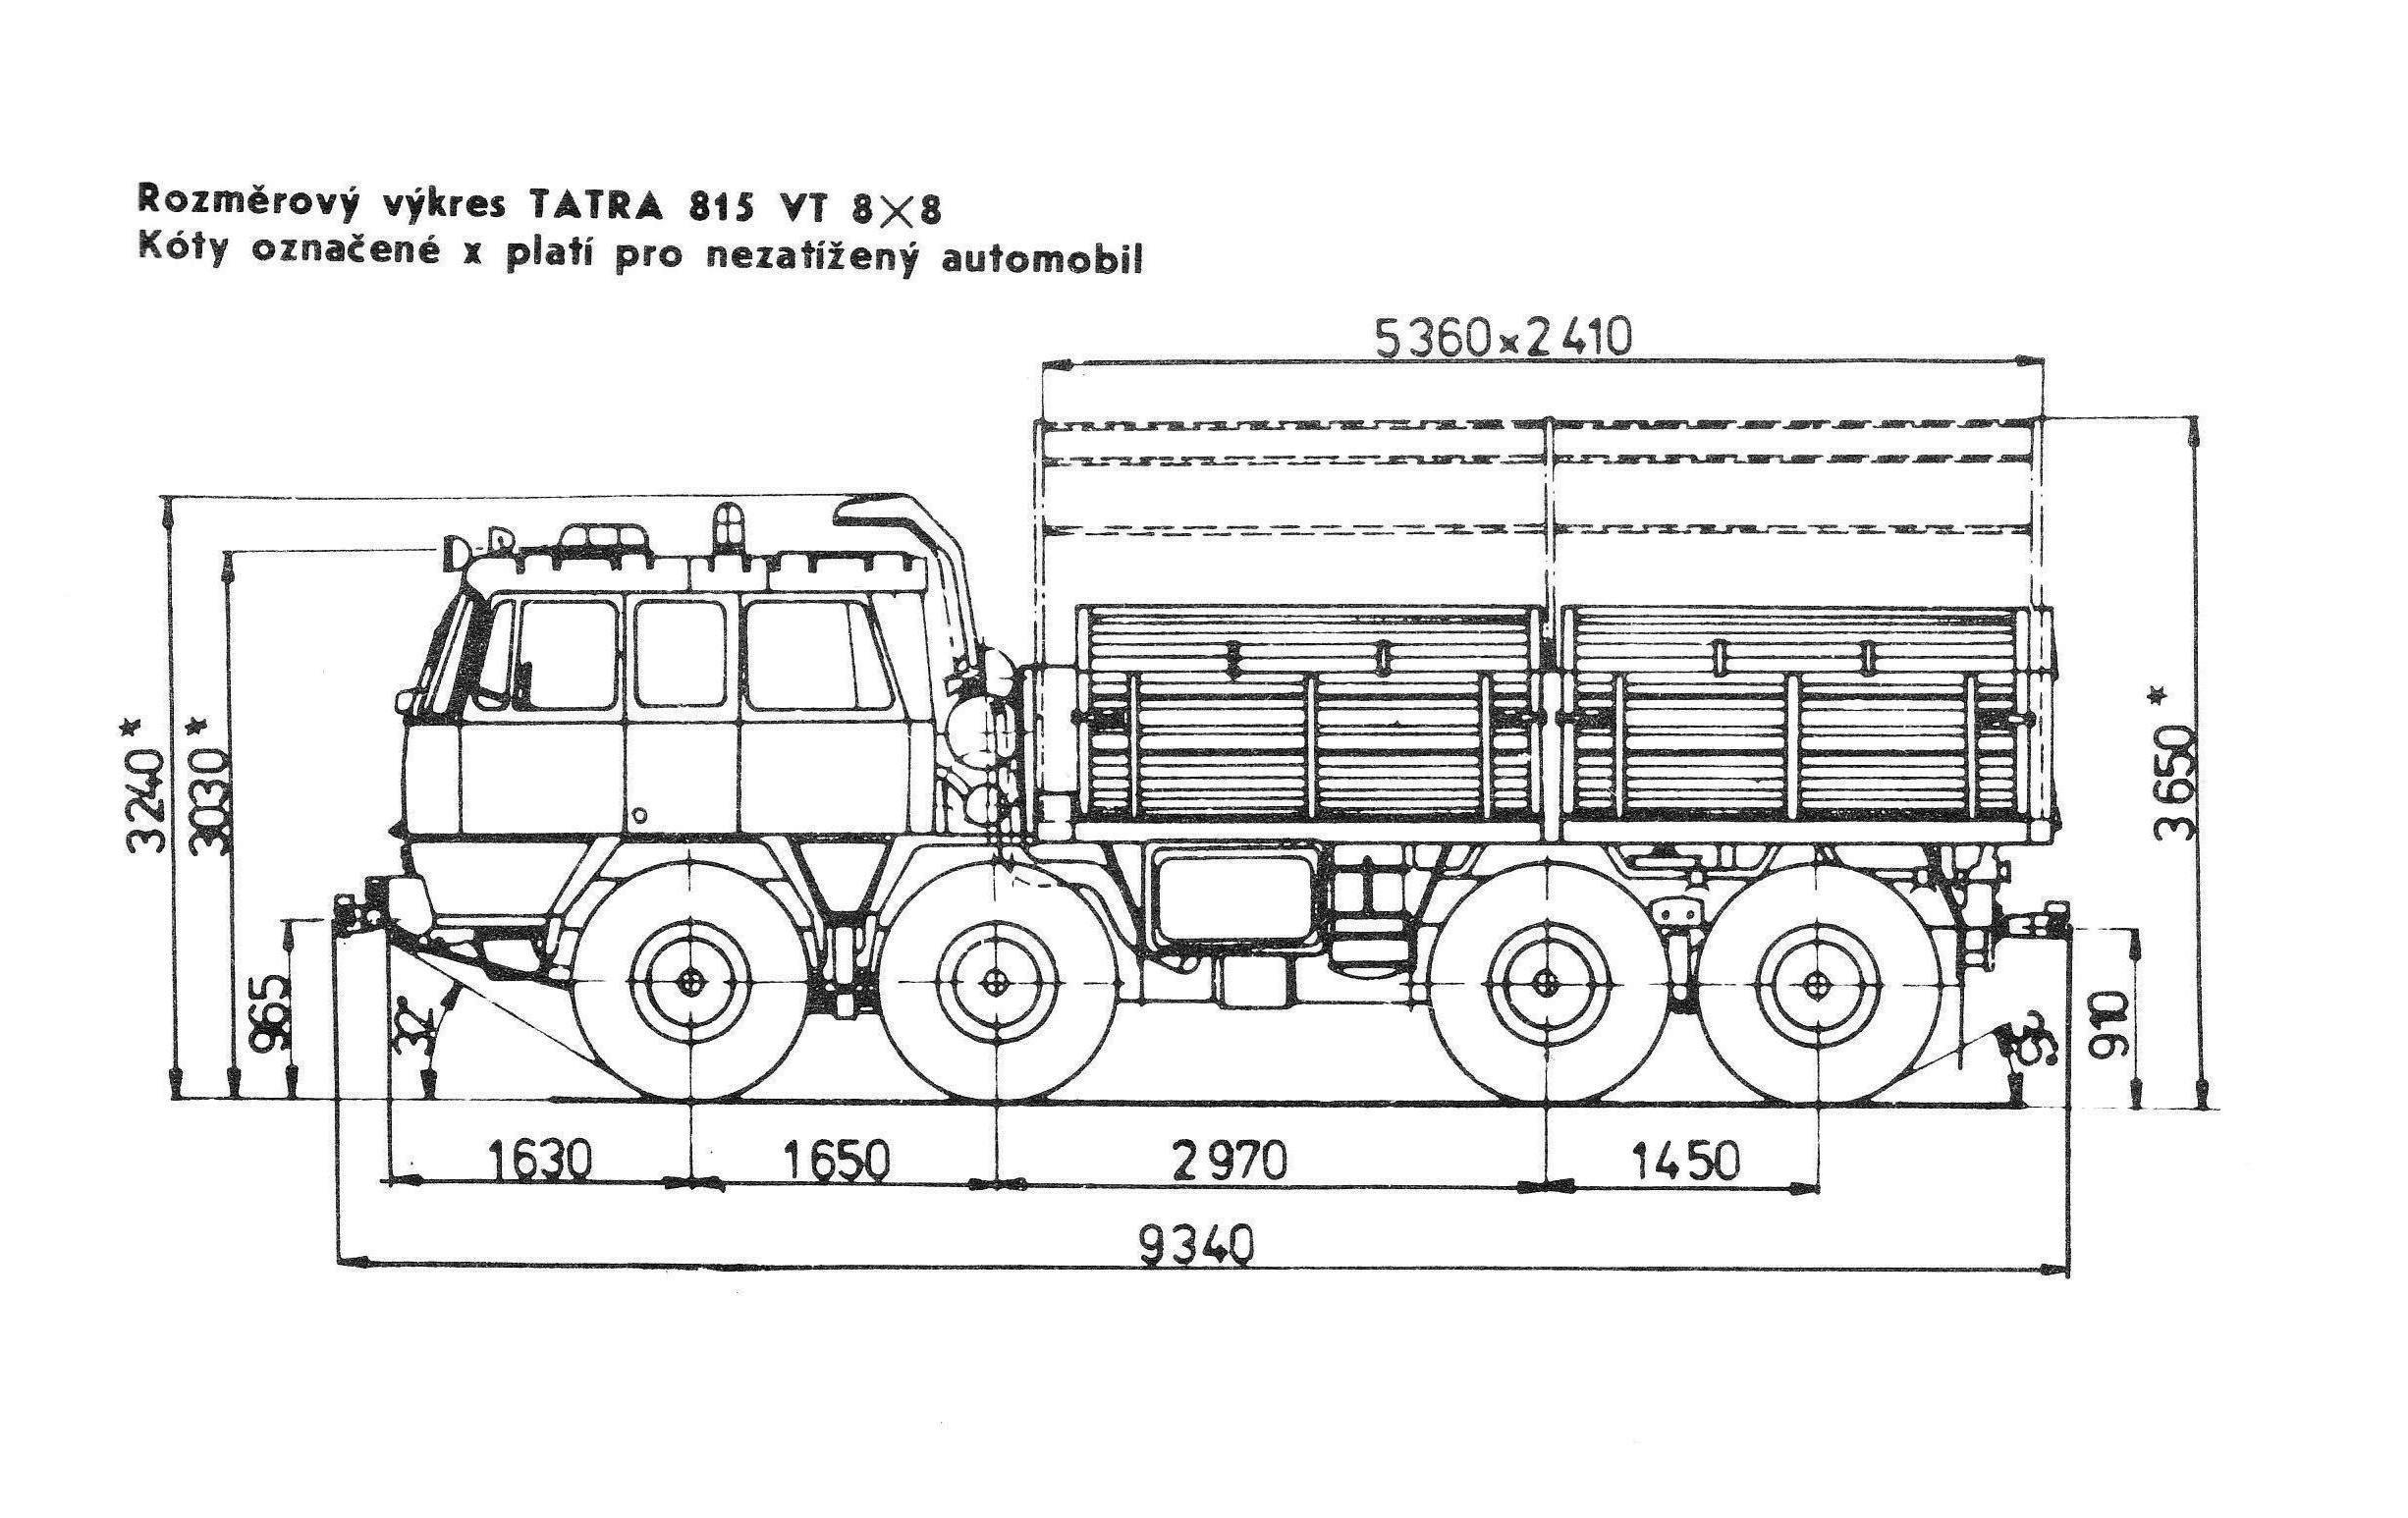 Czk Tatra 815 Vt 26 265 8x8 1r Ceskoslovensko Cr Sr Czk Cze